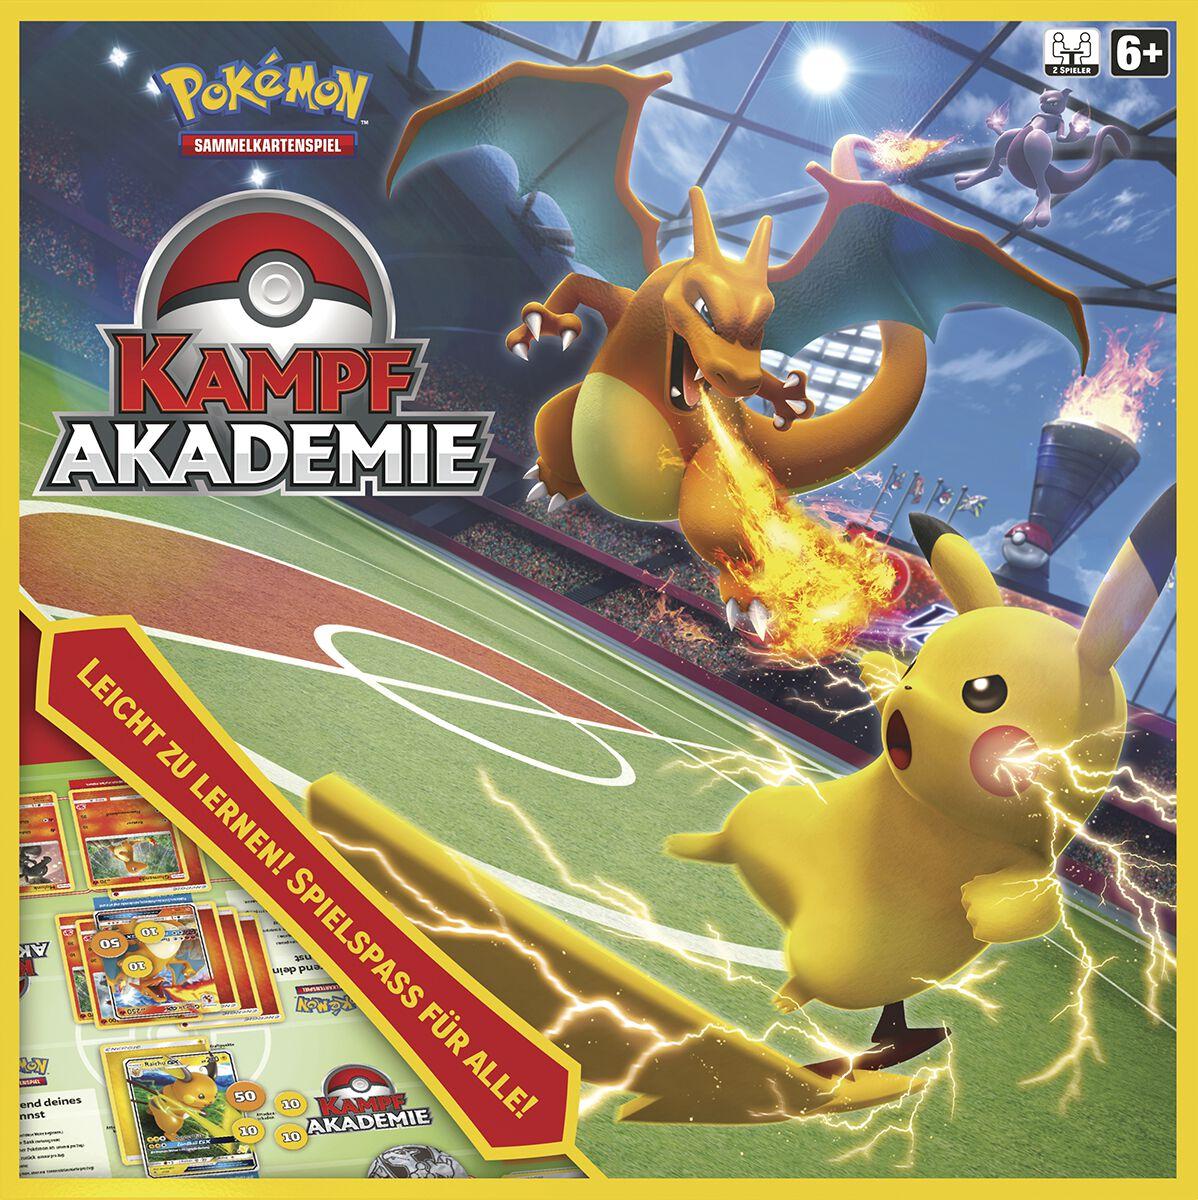 Pokémon Kampfakademie Kartenspiel multicolor 45251